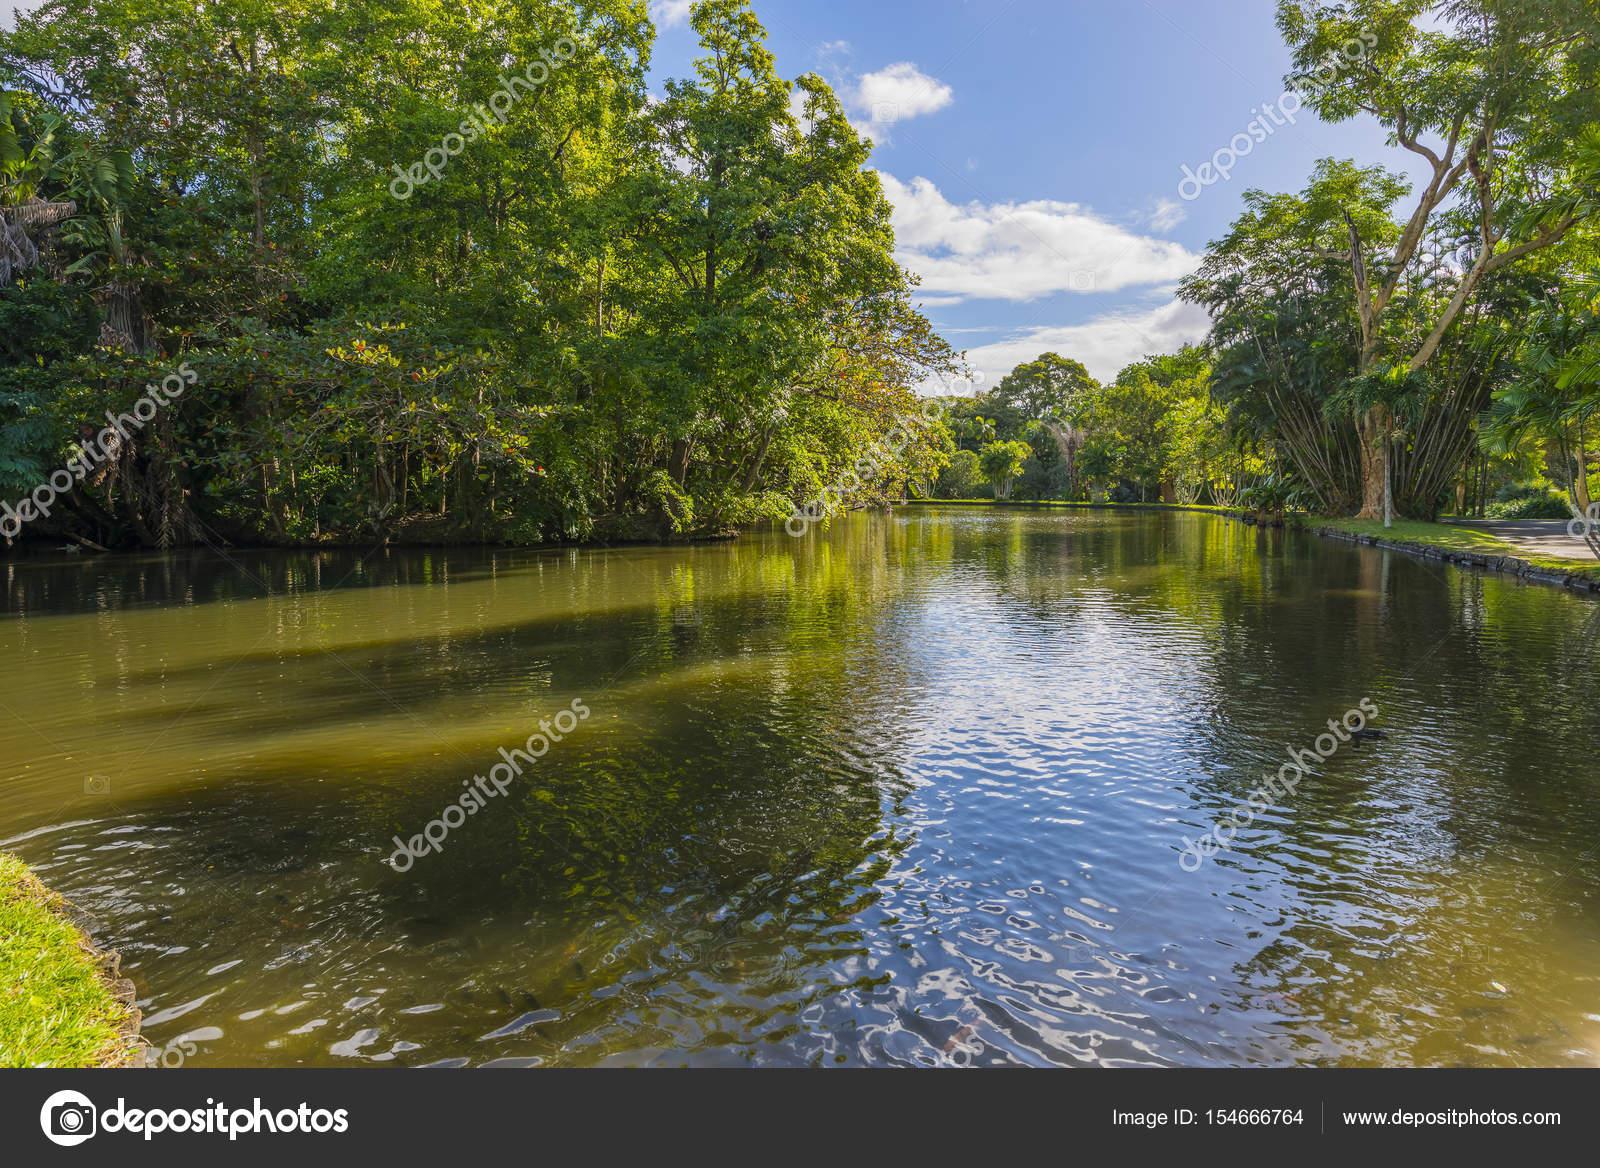 Stagno al giardino botanico di mauritius foto stock for Stagno giardino